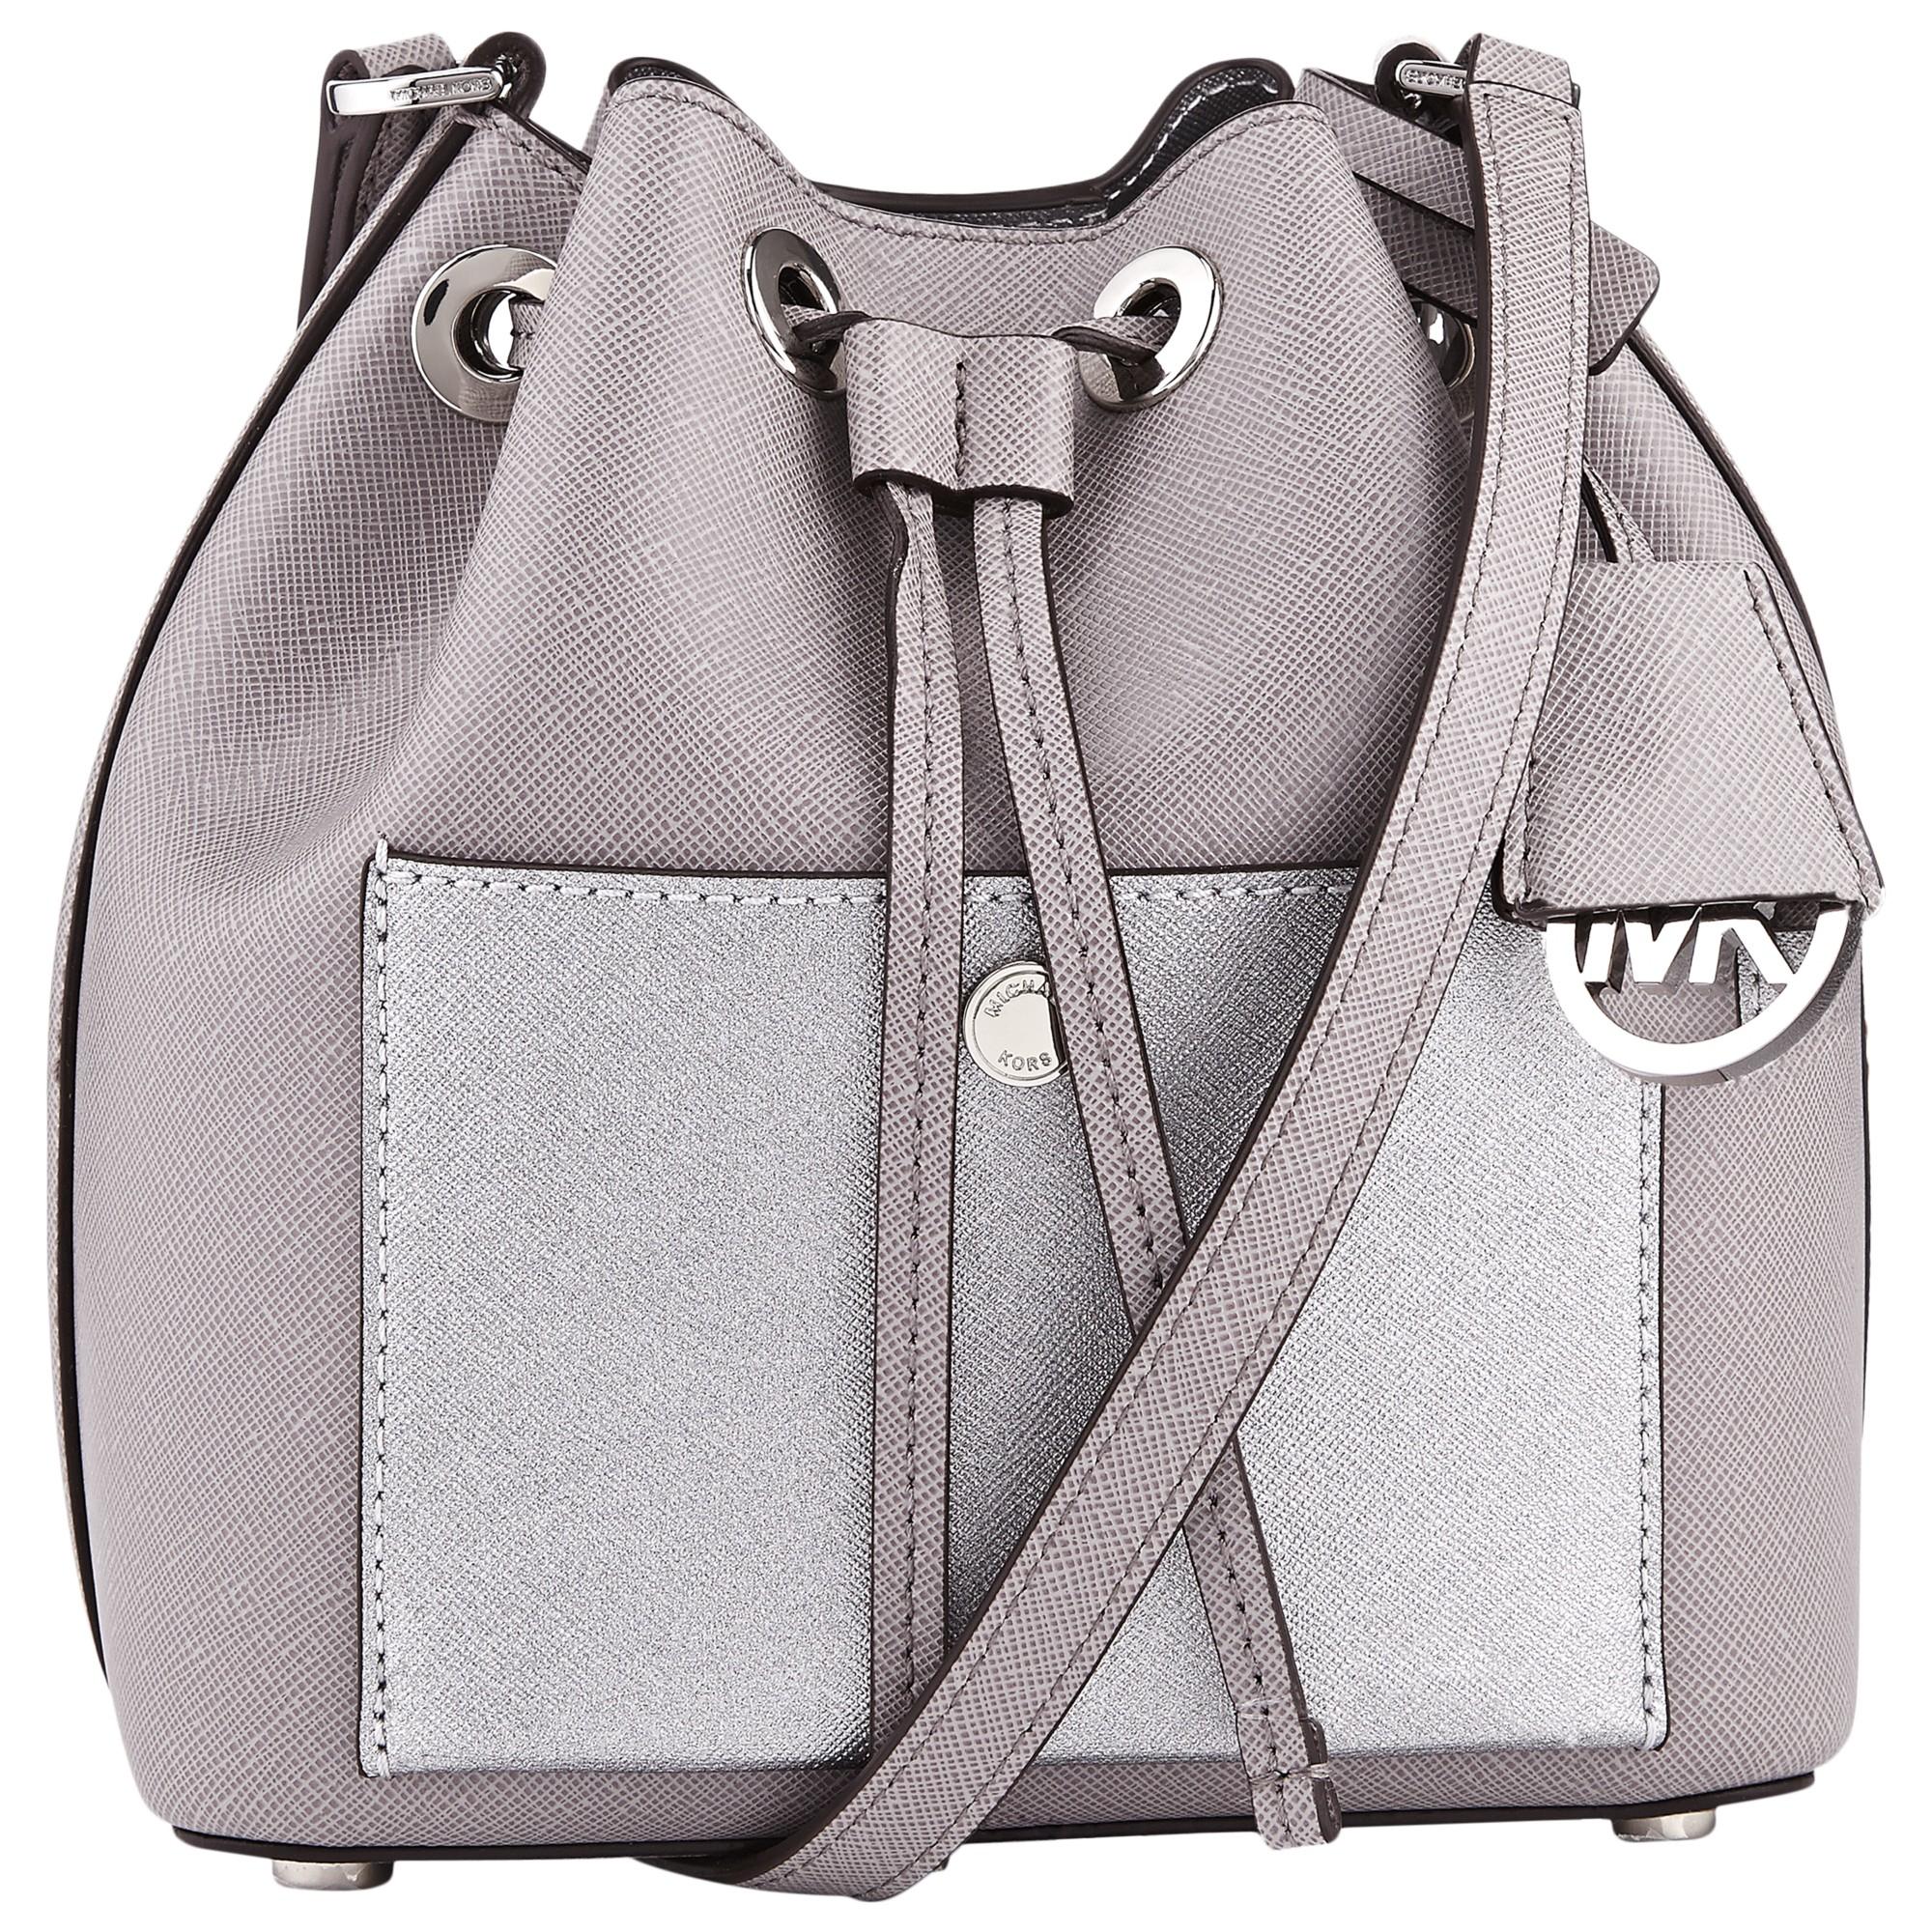 Gallery. Women s Chanel Camera Women s Triple Zip Cross Body Bags Women s Michael  Kors ... c8c3475d25048